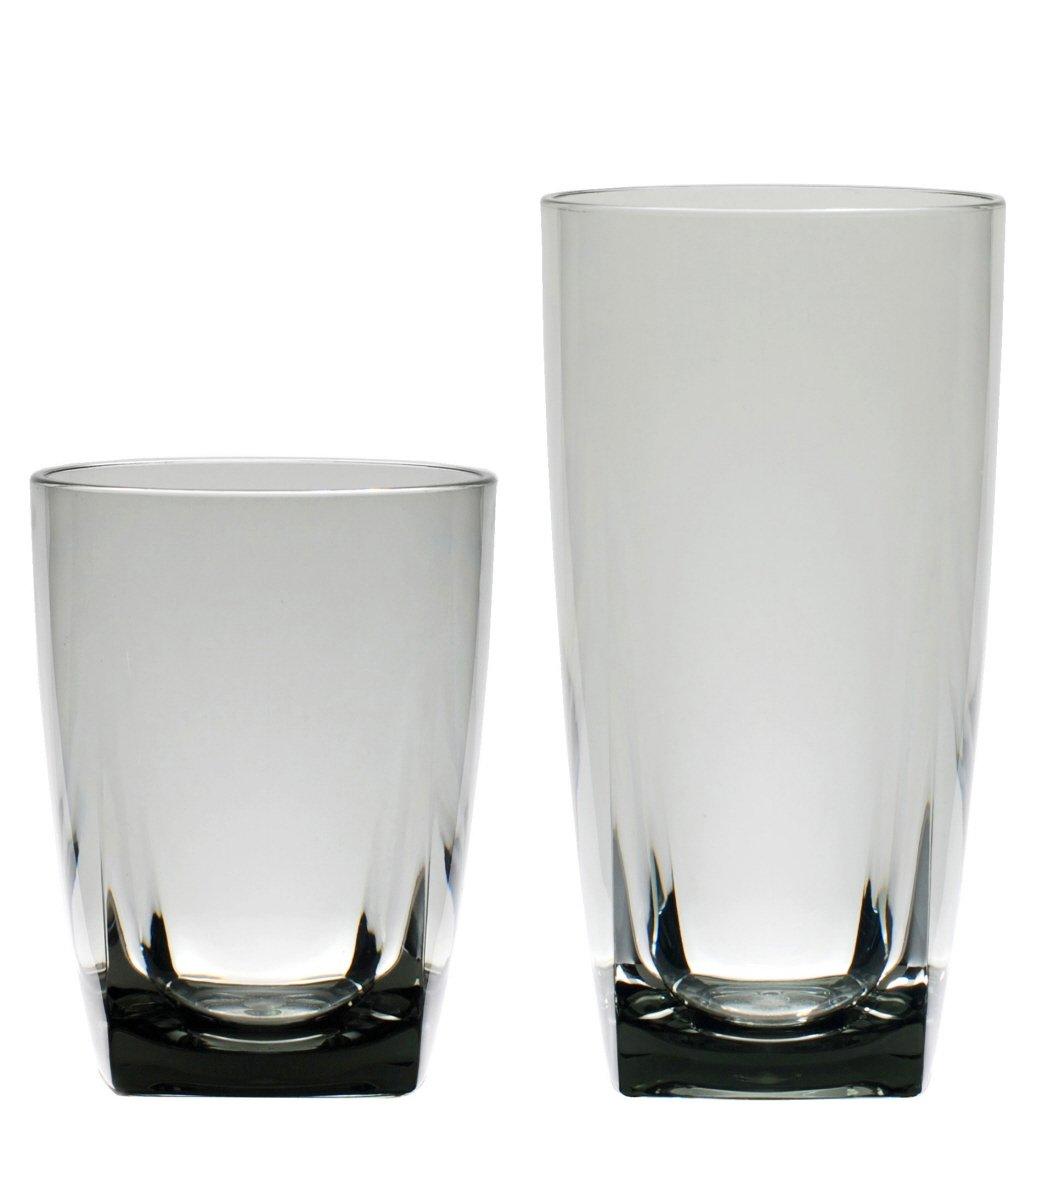 QG 6 pc Clear Smoke Light Grey Acrylic 26 oz Iced Tea Cup w/ Heavy Square Base Plastic Tumbler Set by QG (Image #2)